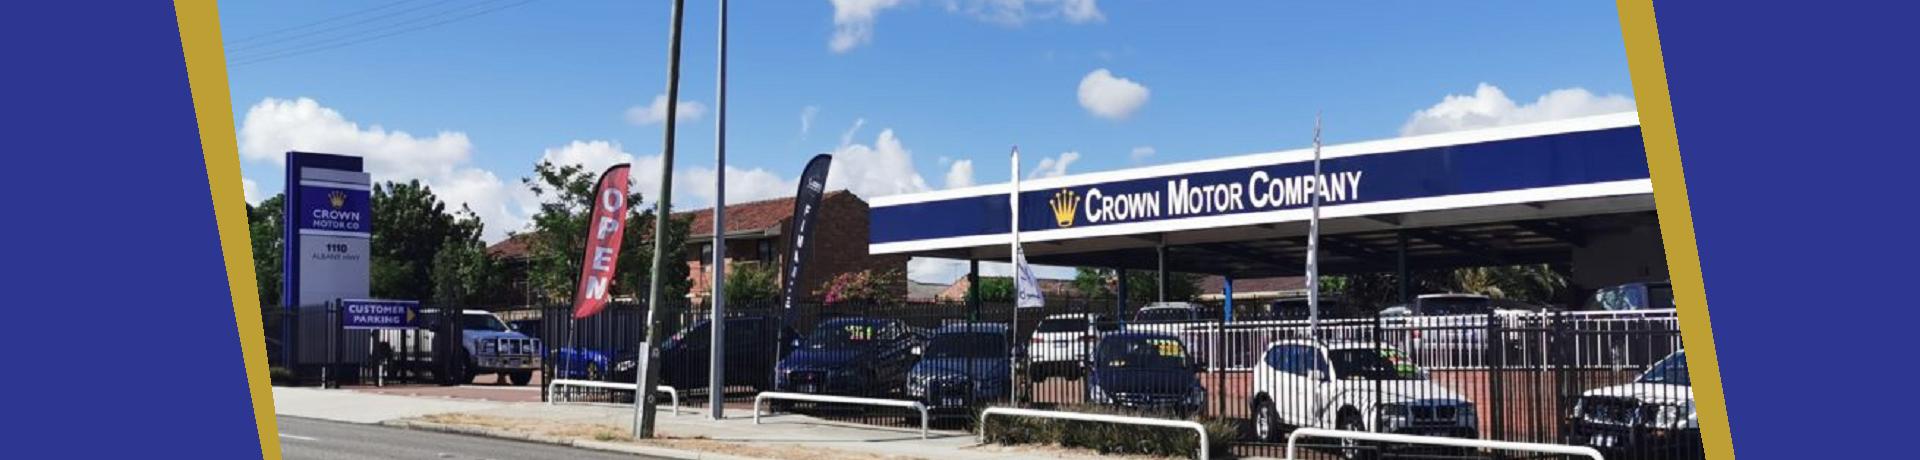 Crown Caravans location-1